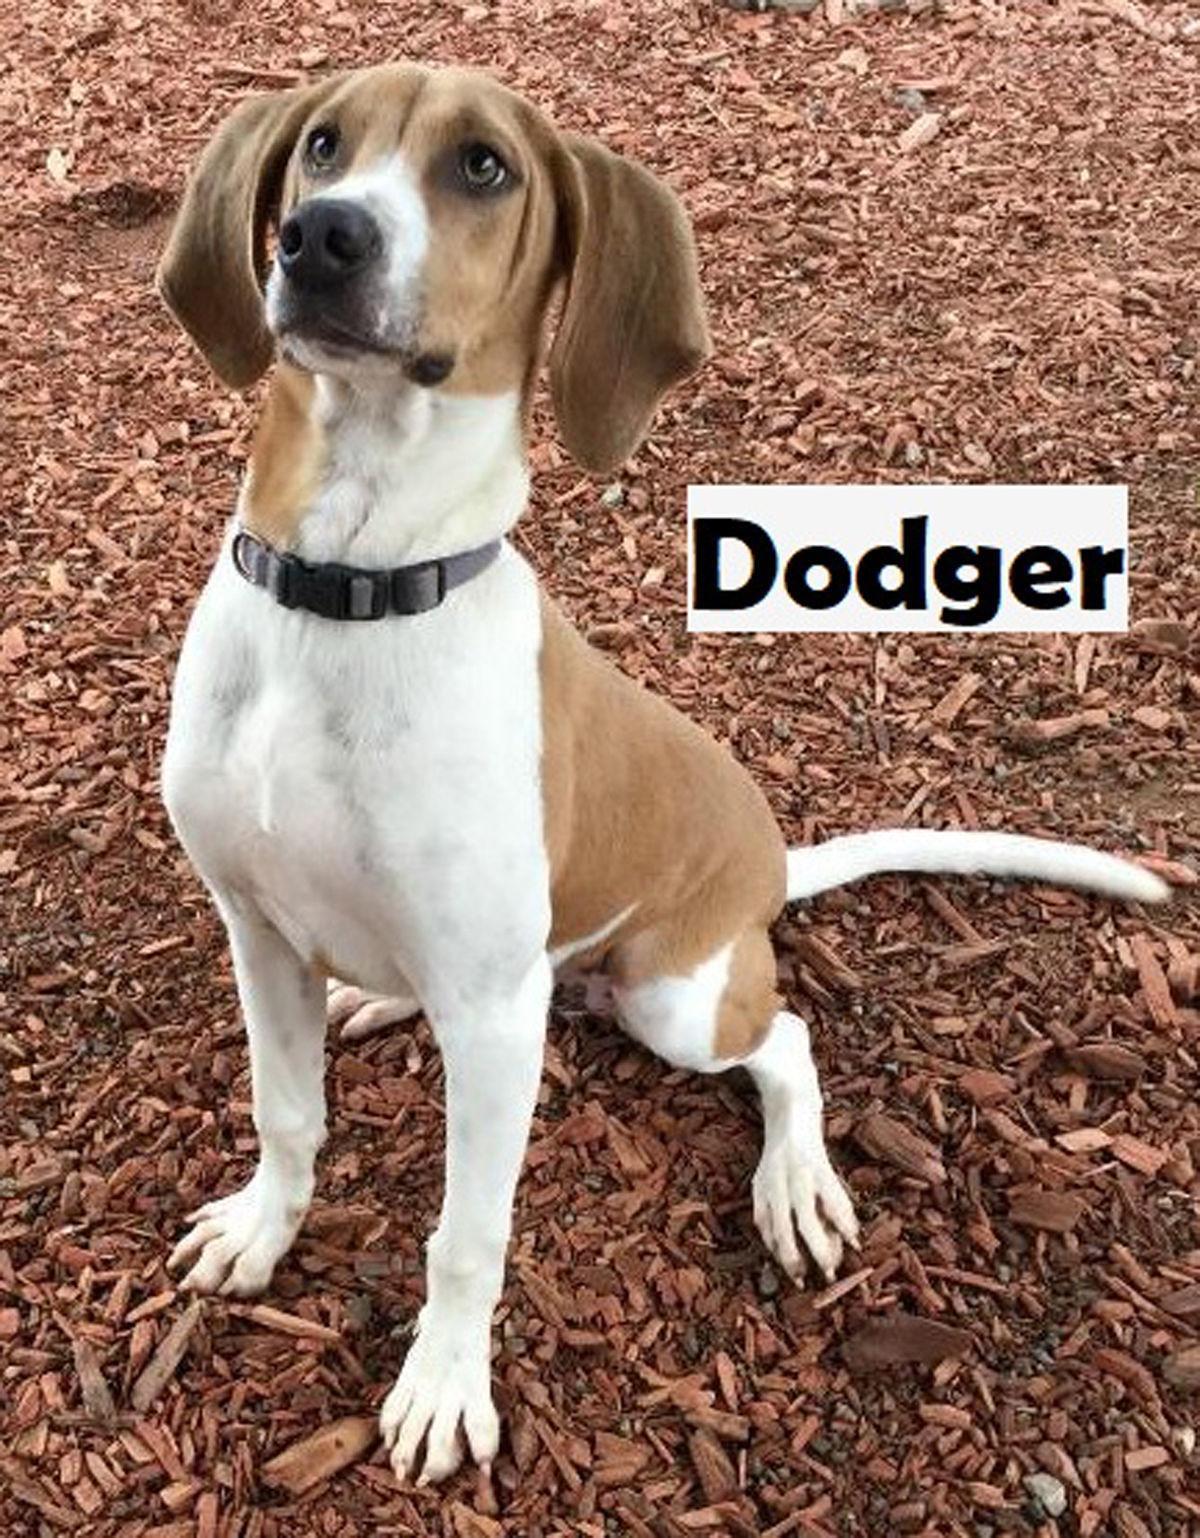 Take me home Dodger